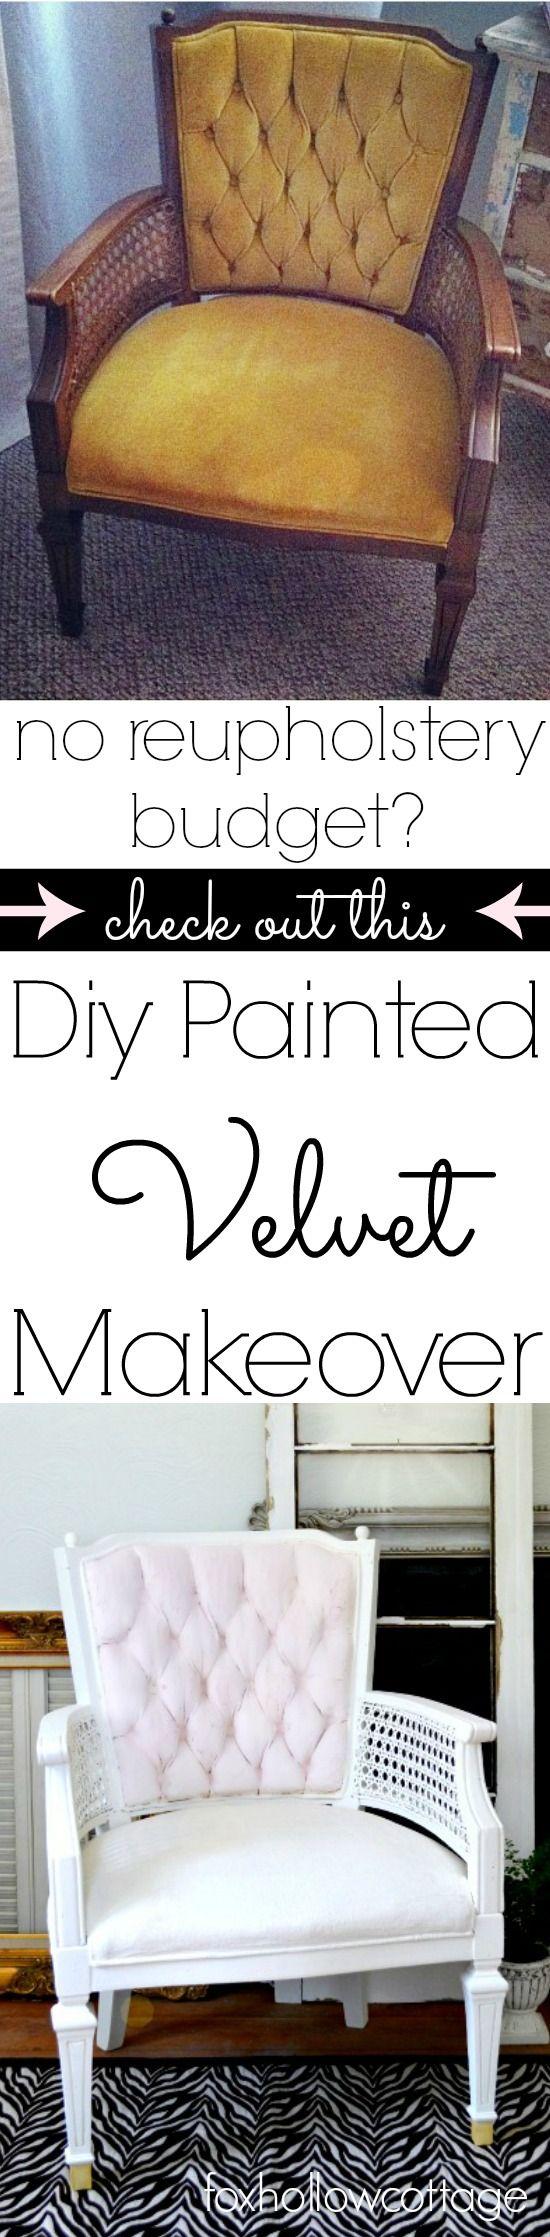 DIY painted upholstery furniture makeover | #paintedfurniture #diydecoratingideas